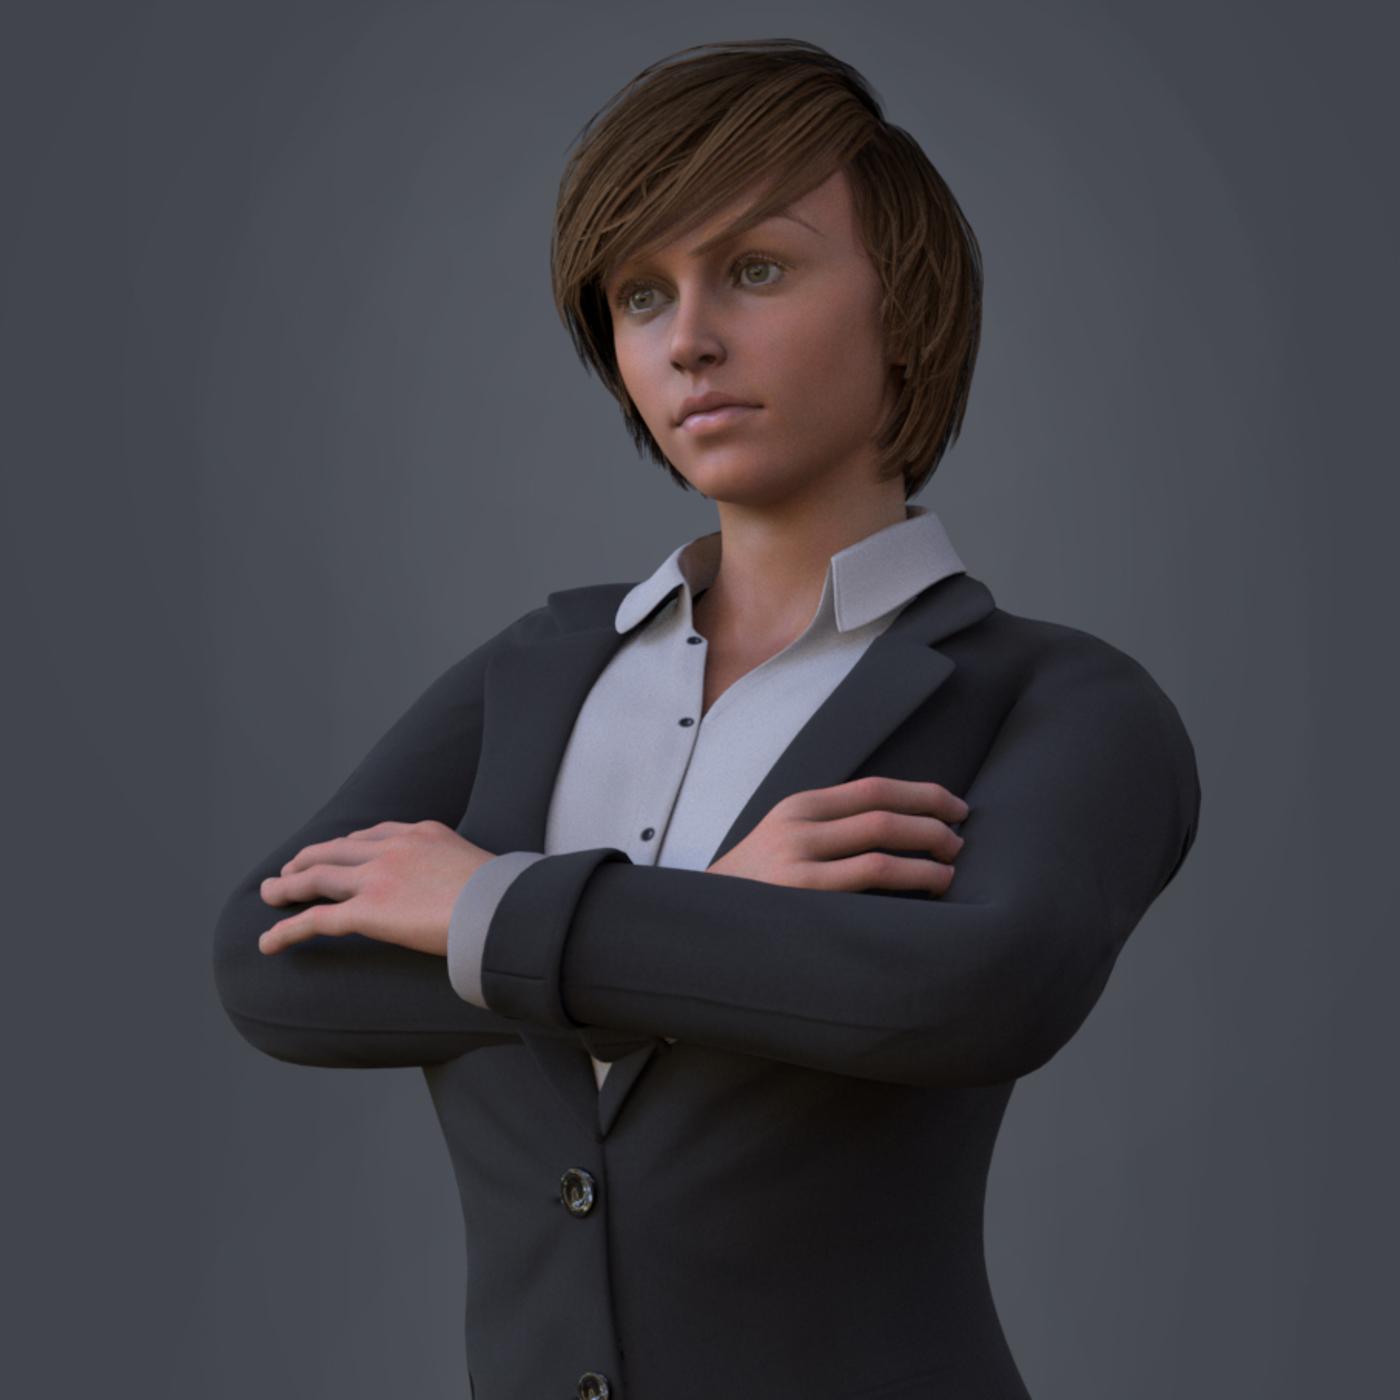 Corporate Woman